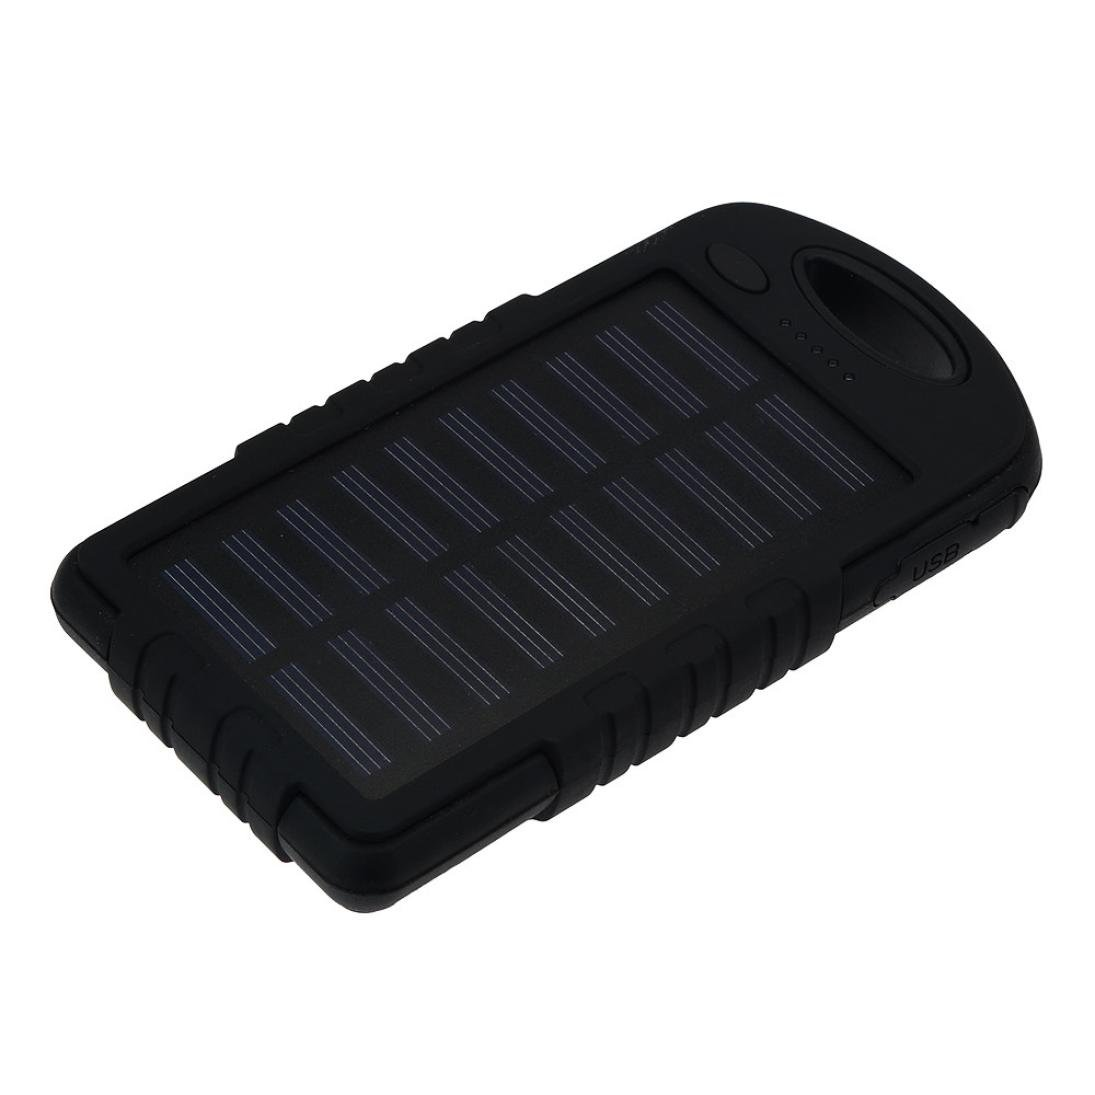 Gotd 10000mAh Portable Solar Charger LED Dual USB External Battery Power Bank, Black